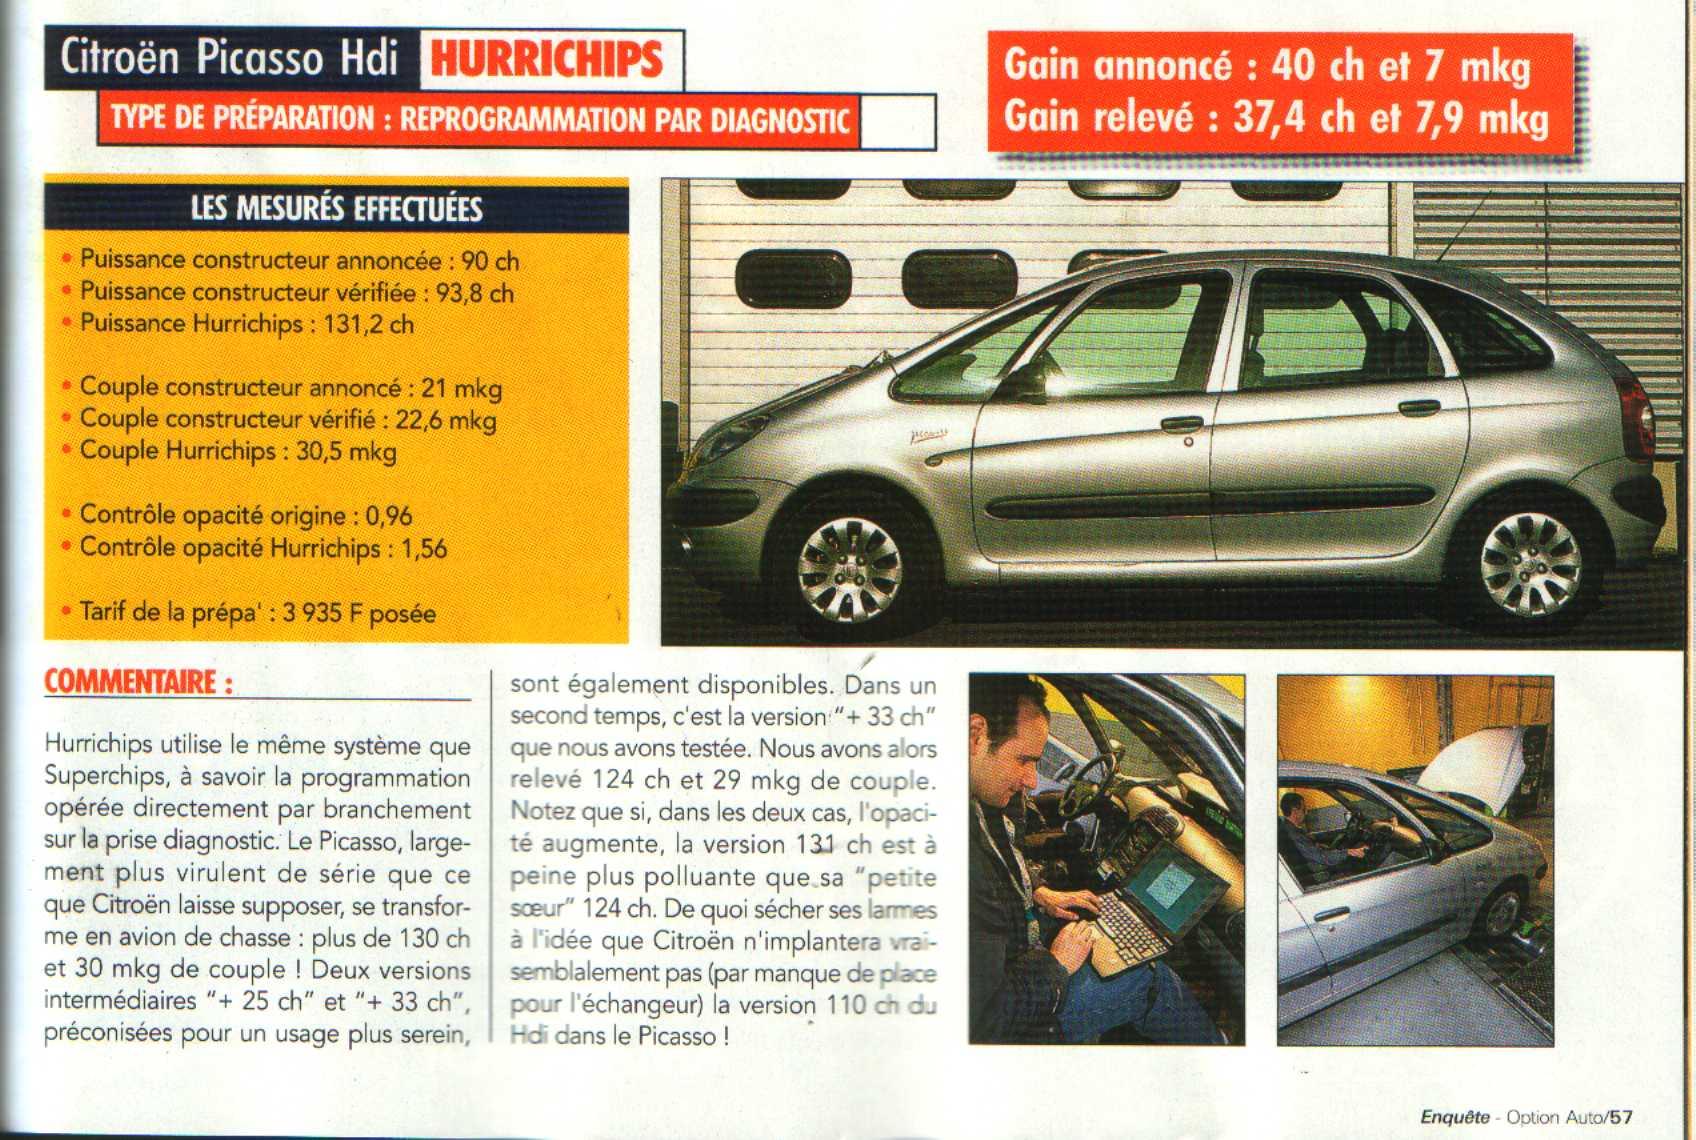 Xsara Picasso 2000 HDI 90 CV Reprogrammation boitier Bosch